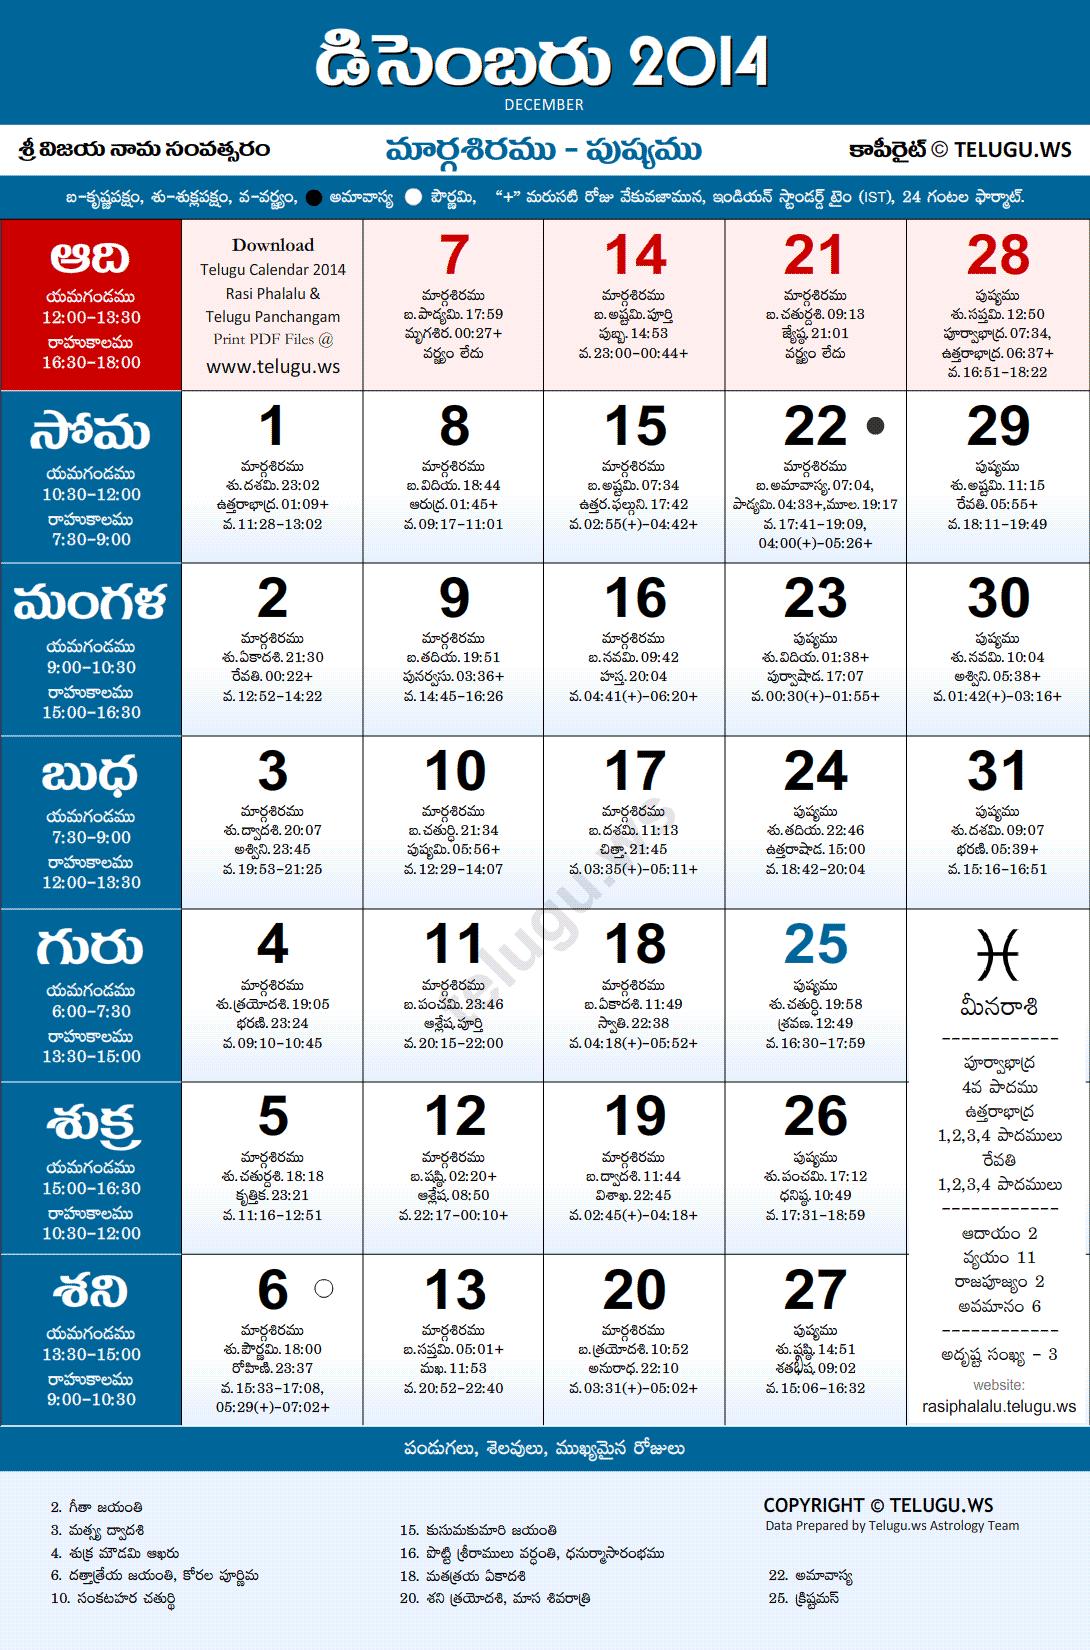 Venkatrama and co telugu calendar 2014 | andhra-telugu.